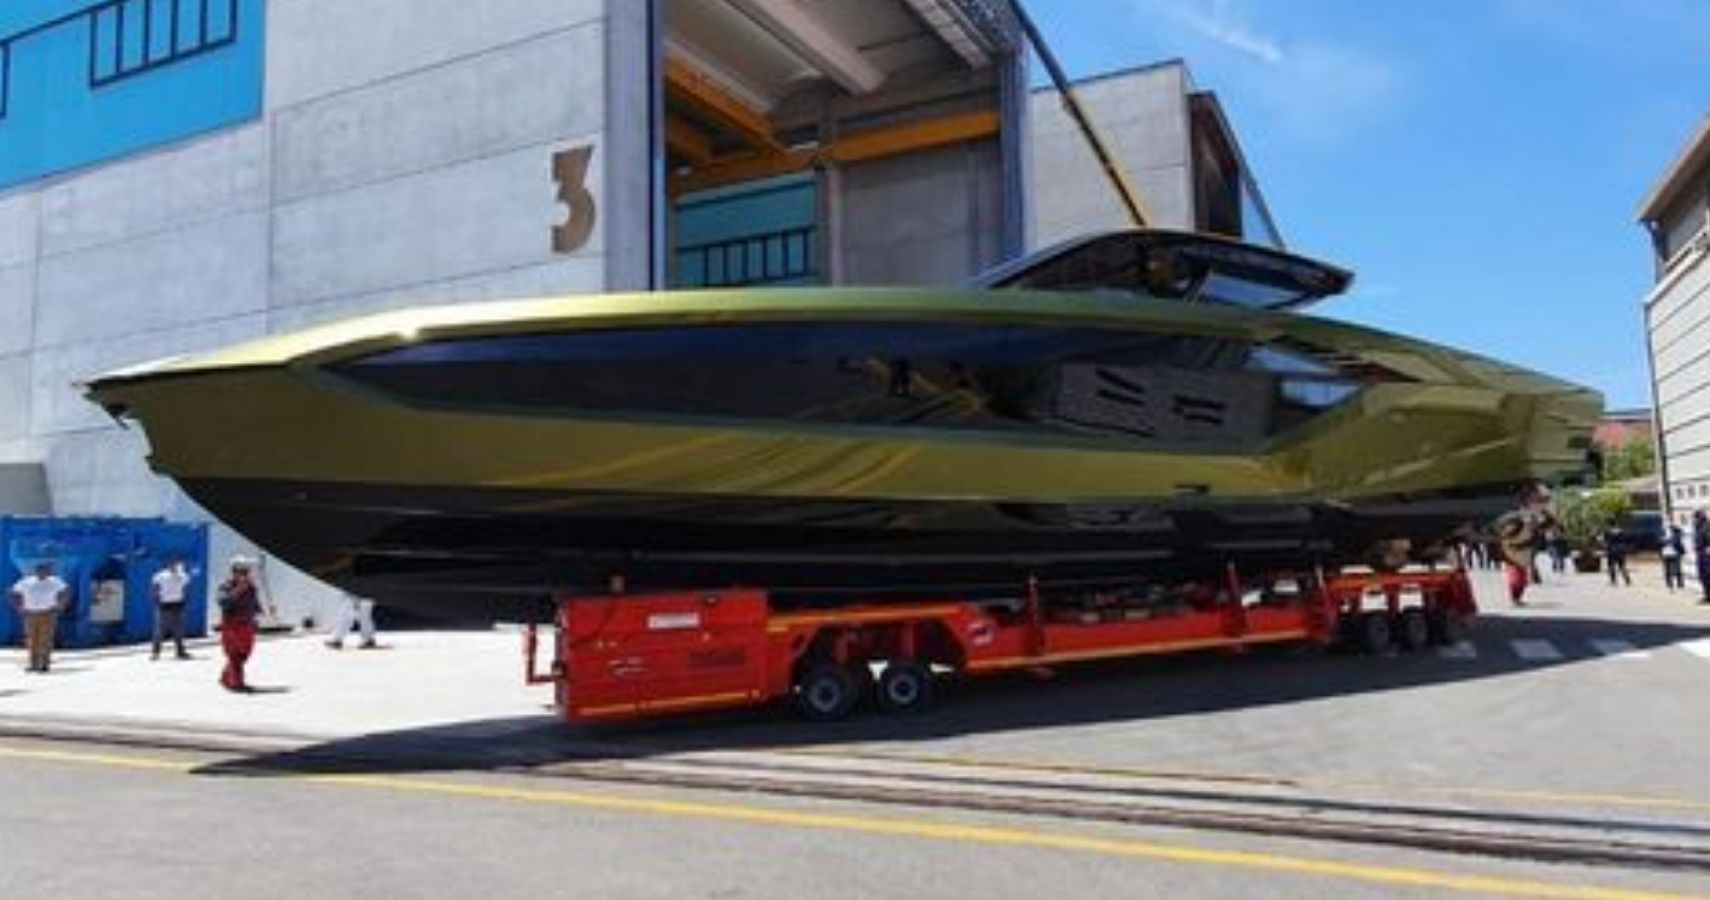 How Conor McGregor Made His $4 Million Lamborghini Yacht Even More Exclusive